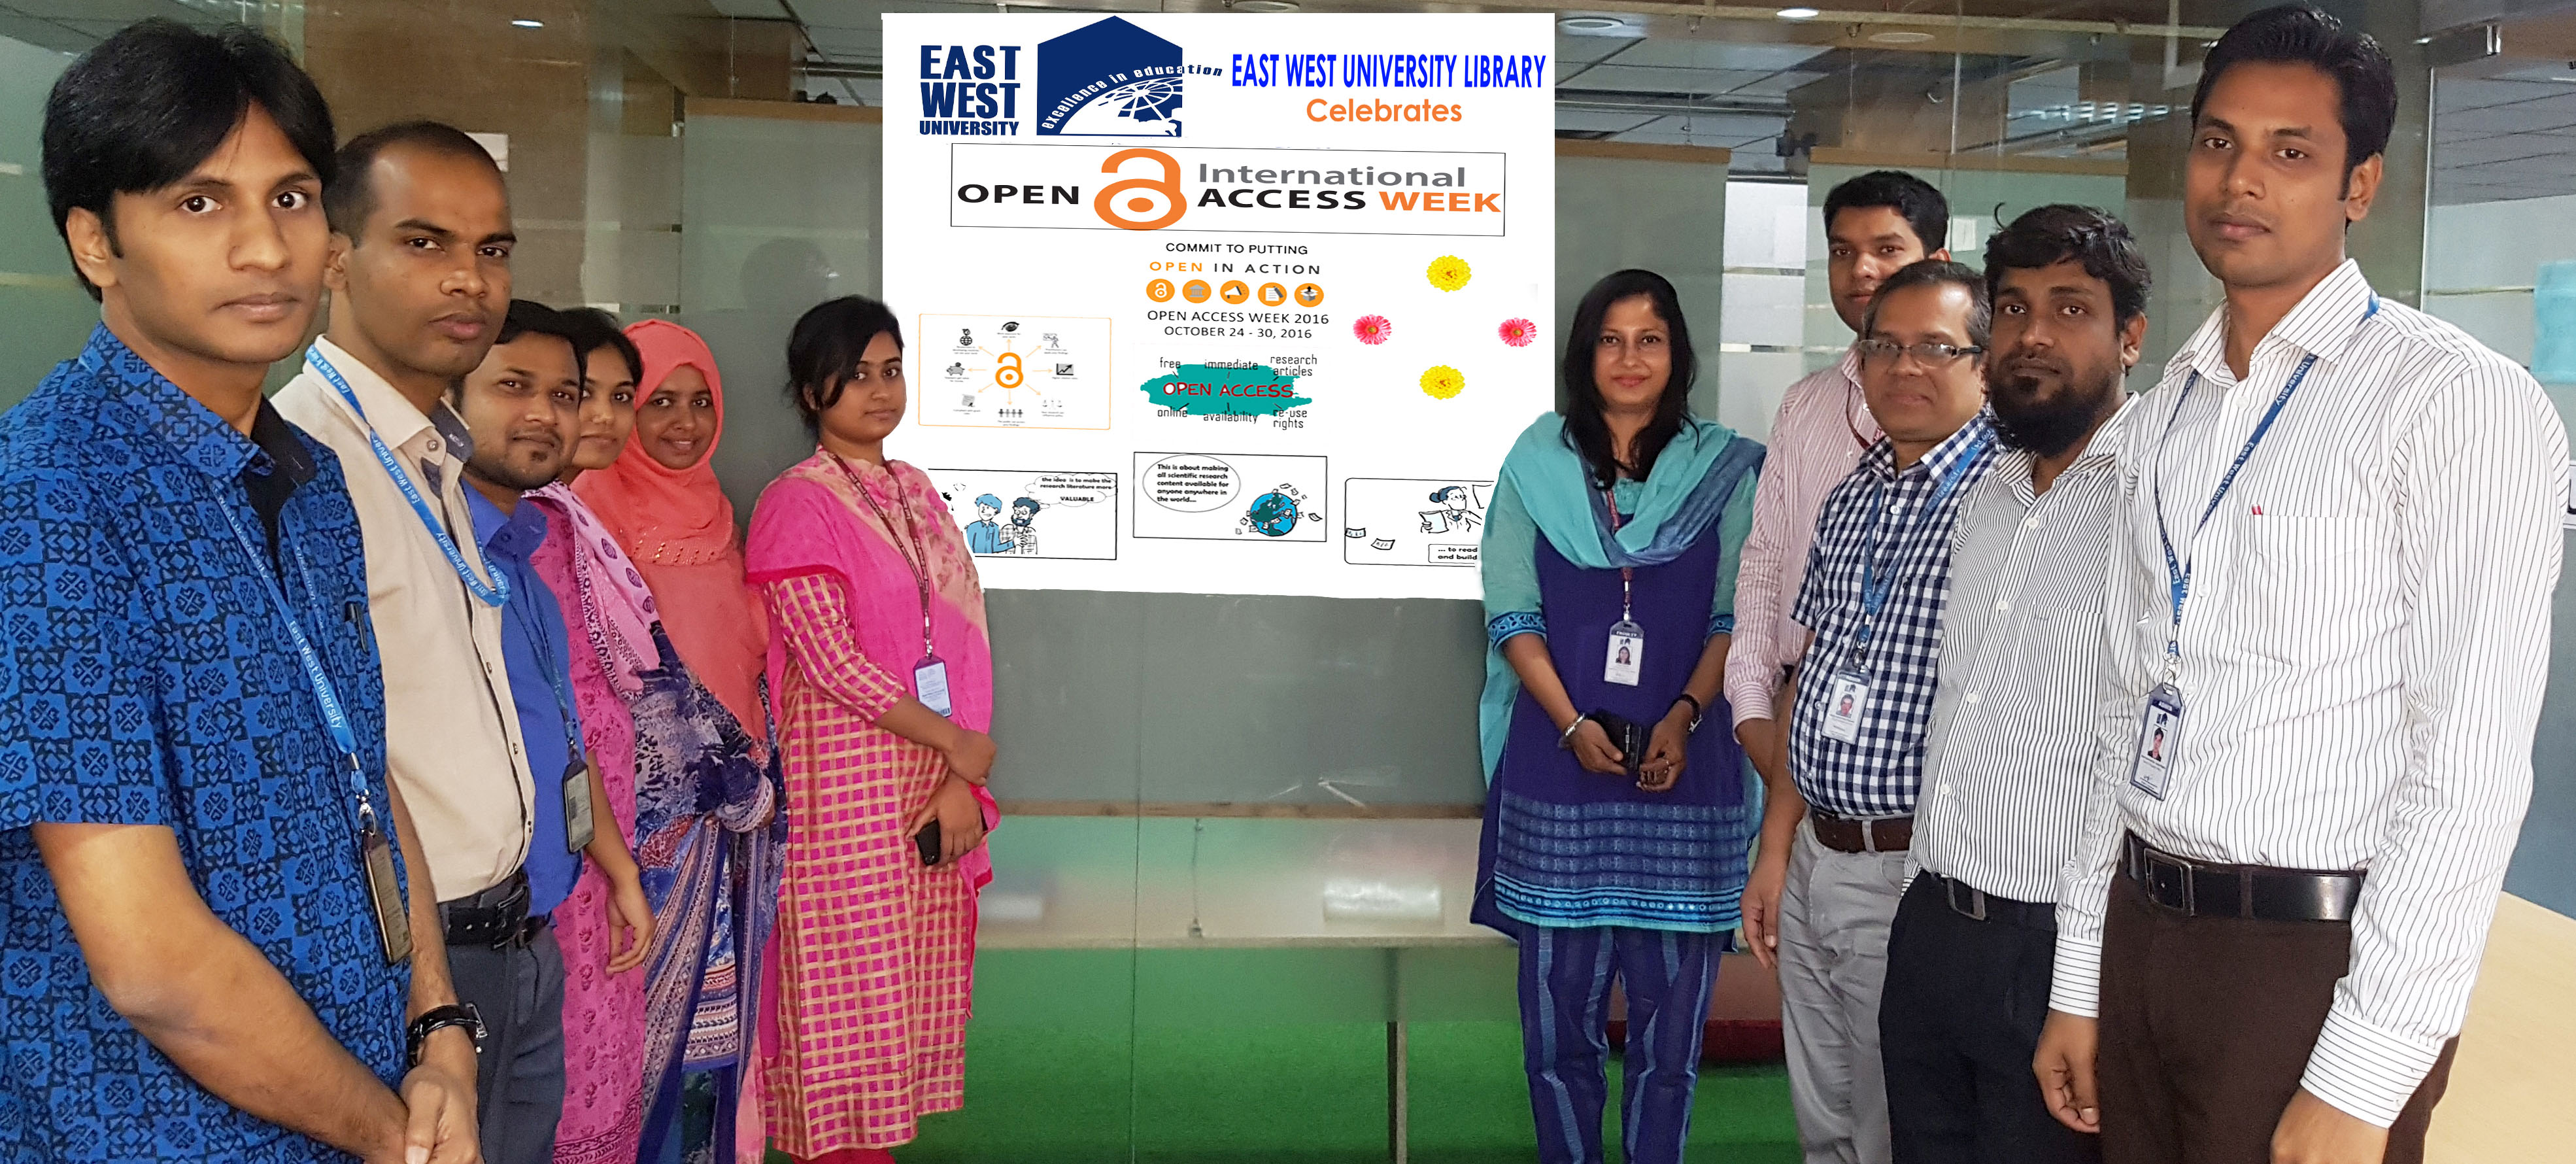 EWU Library Celebrated International Open Access Week 2016.jpg